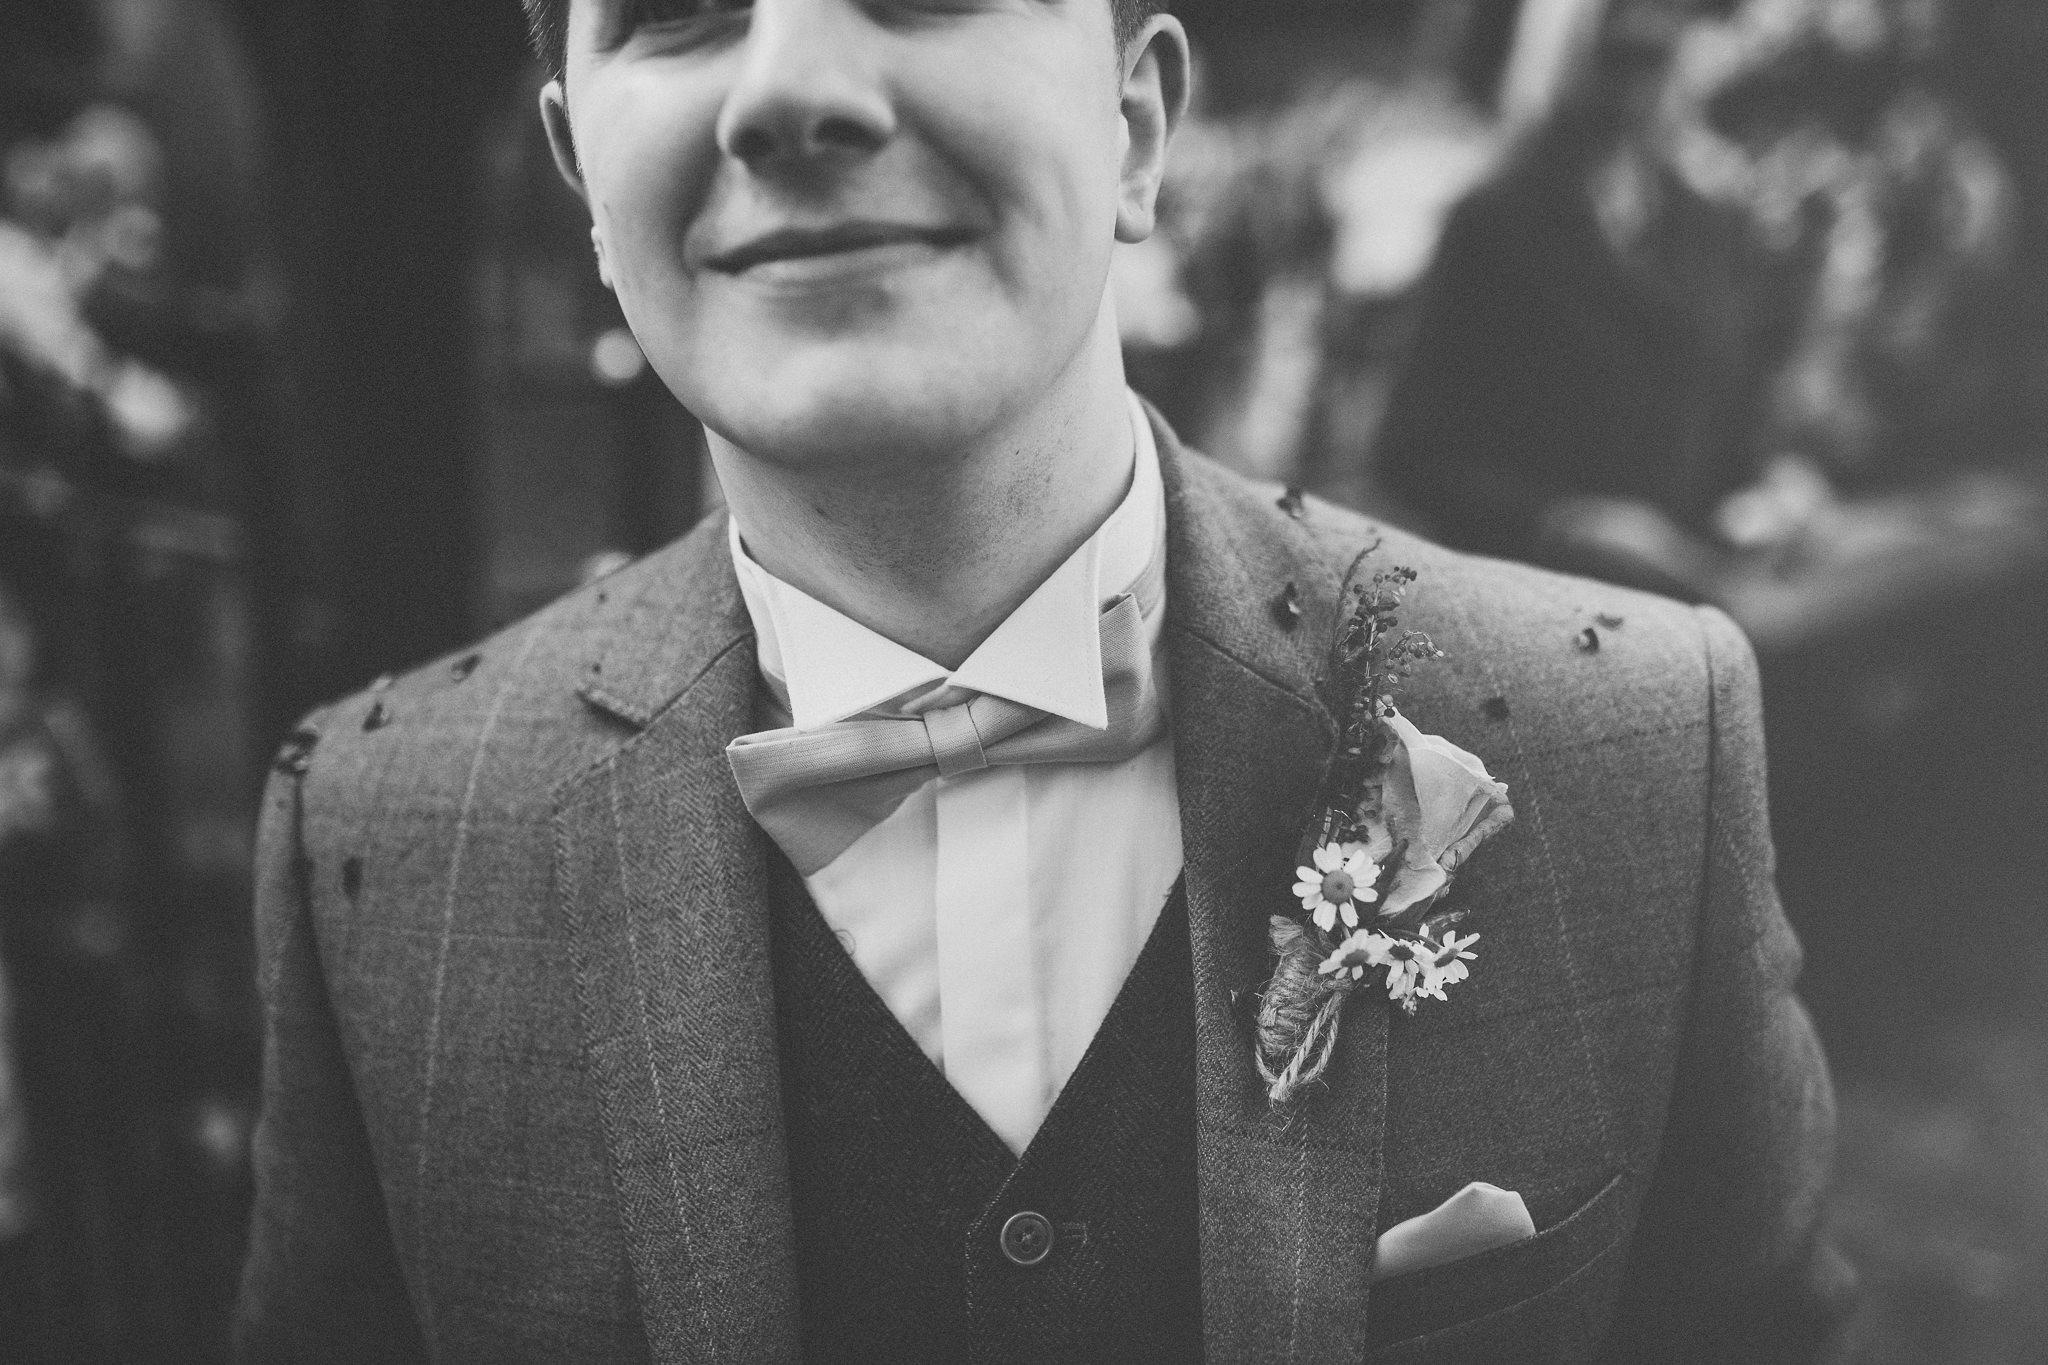 Lancashire-Creative-natural-documentary-wedding-photography-90054